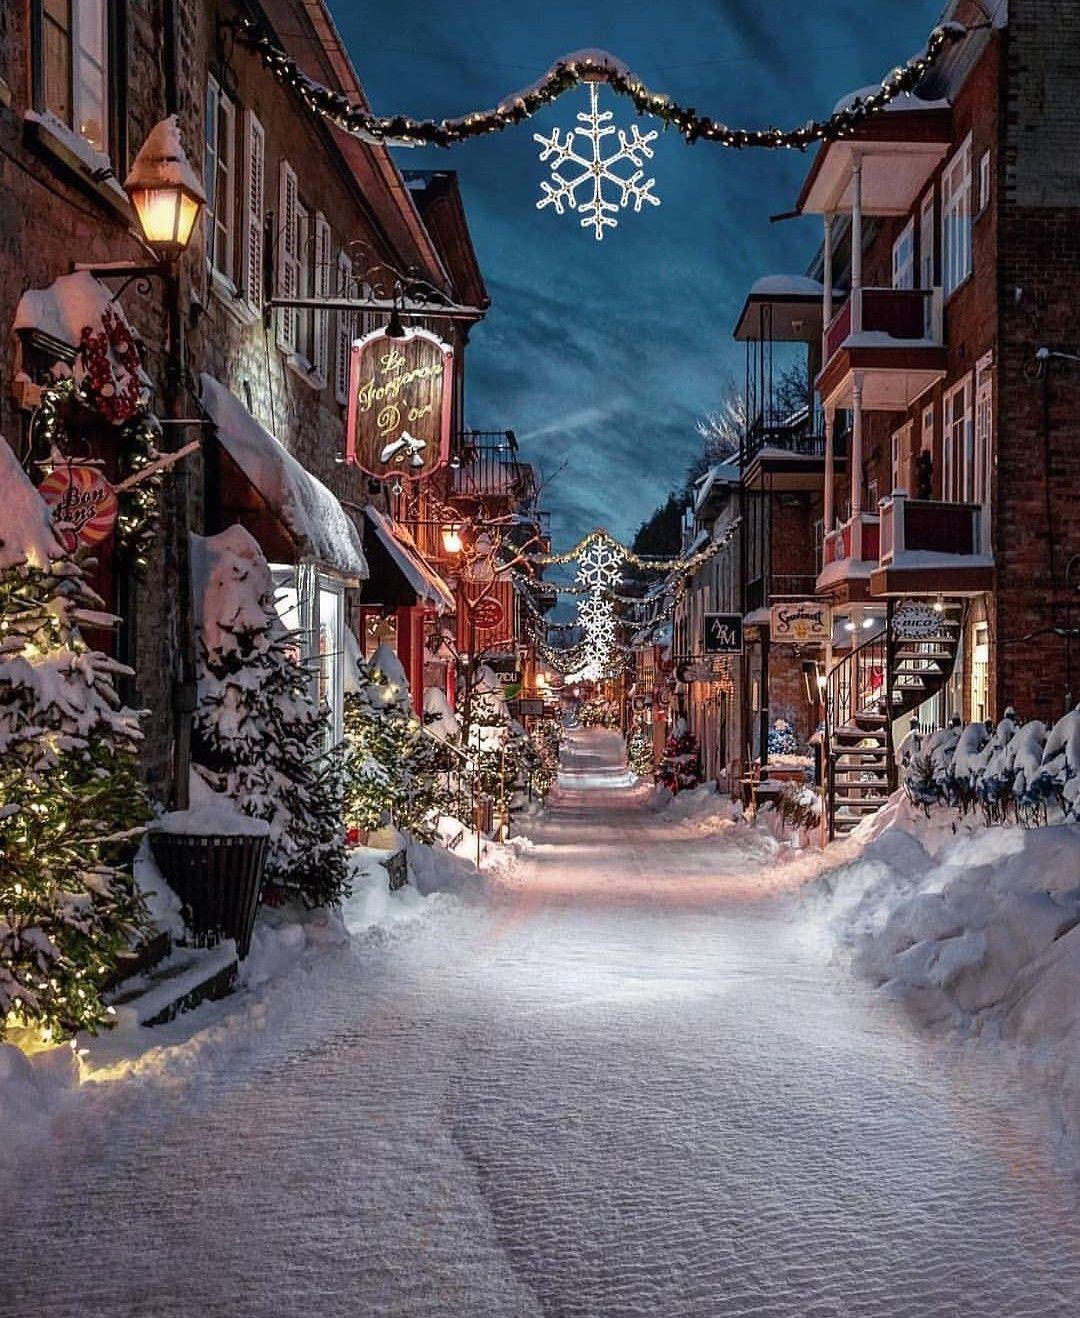 Quebec City Canada Snow Christmas City Instagram Manucoveney Christmas Town Winter Scenery Winter Photos